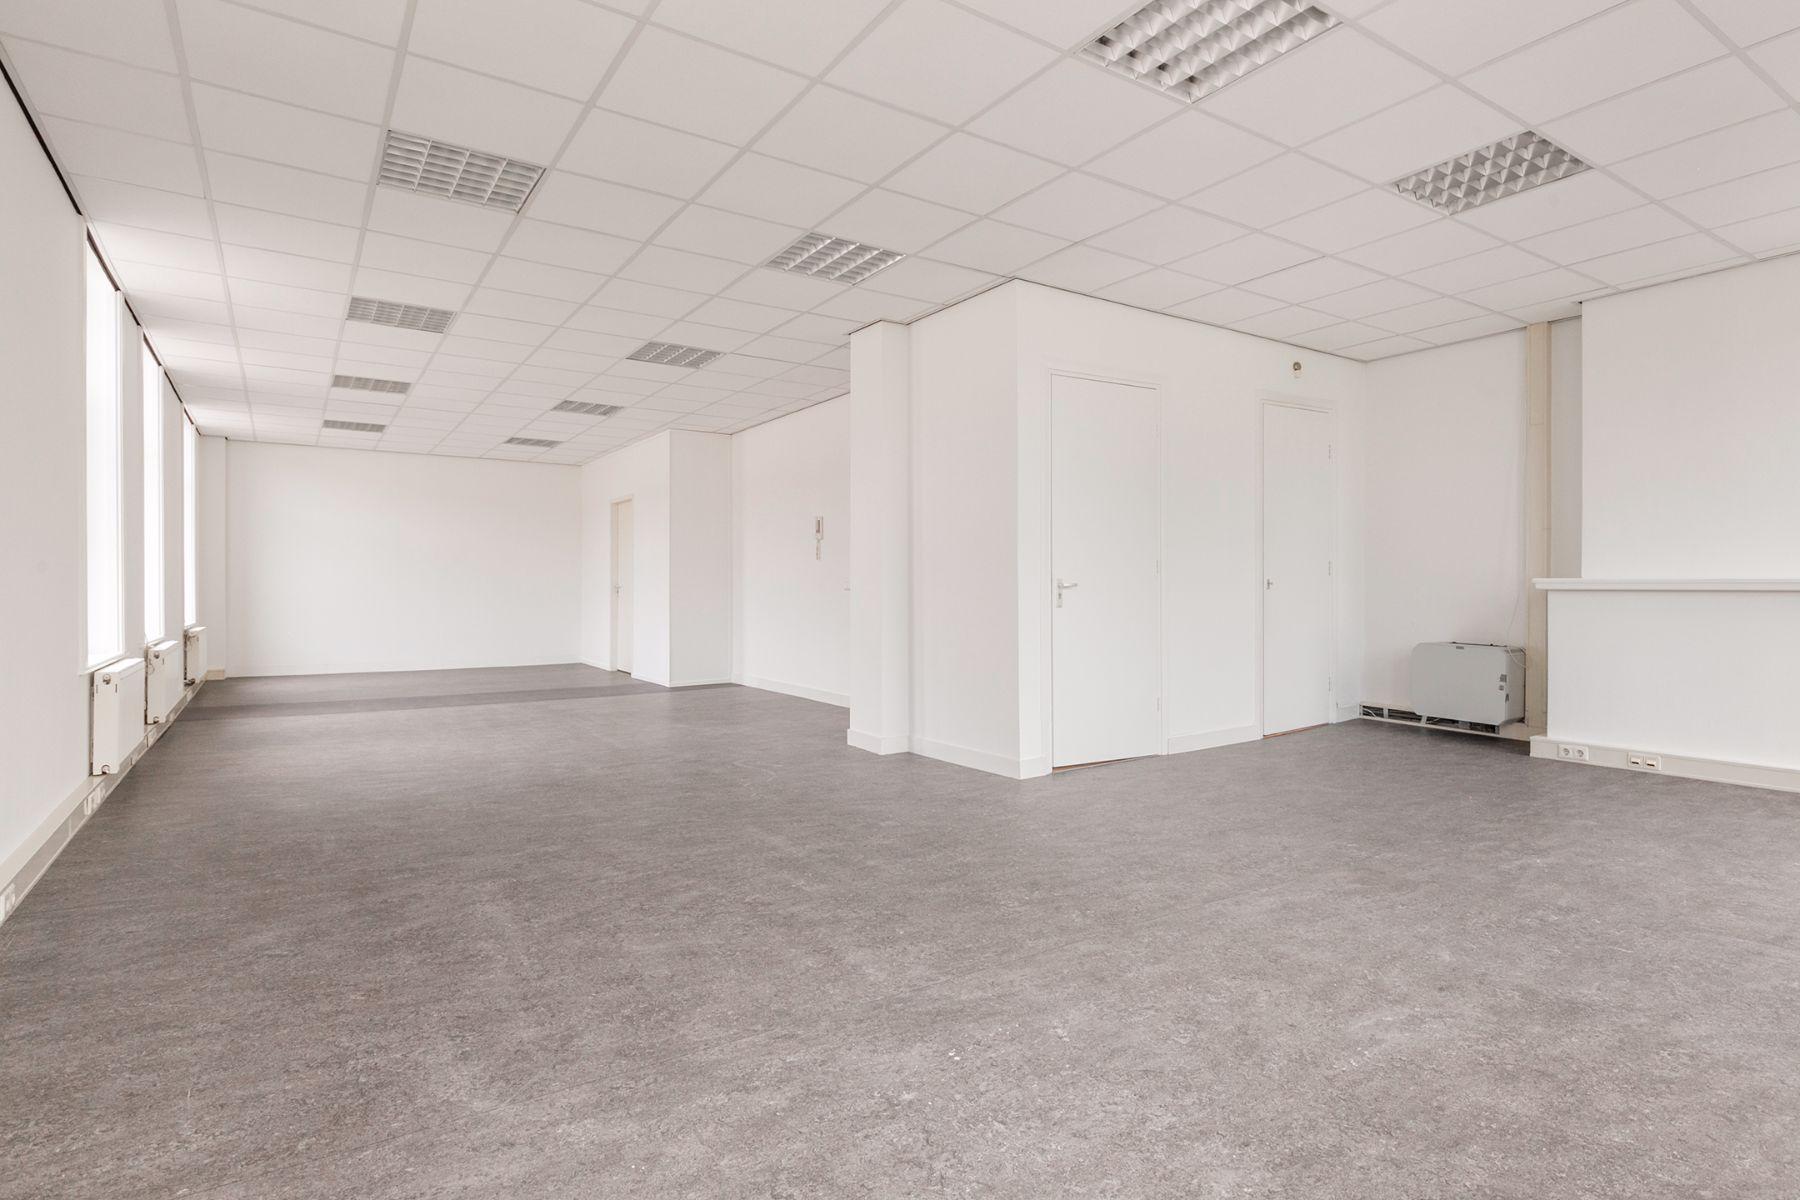 kantoorruimte 2.0